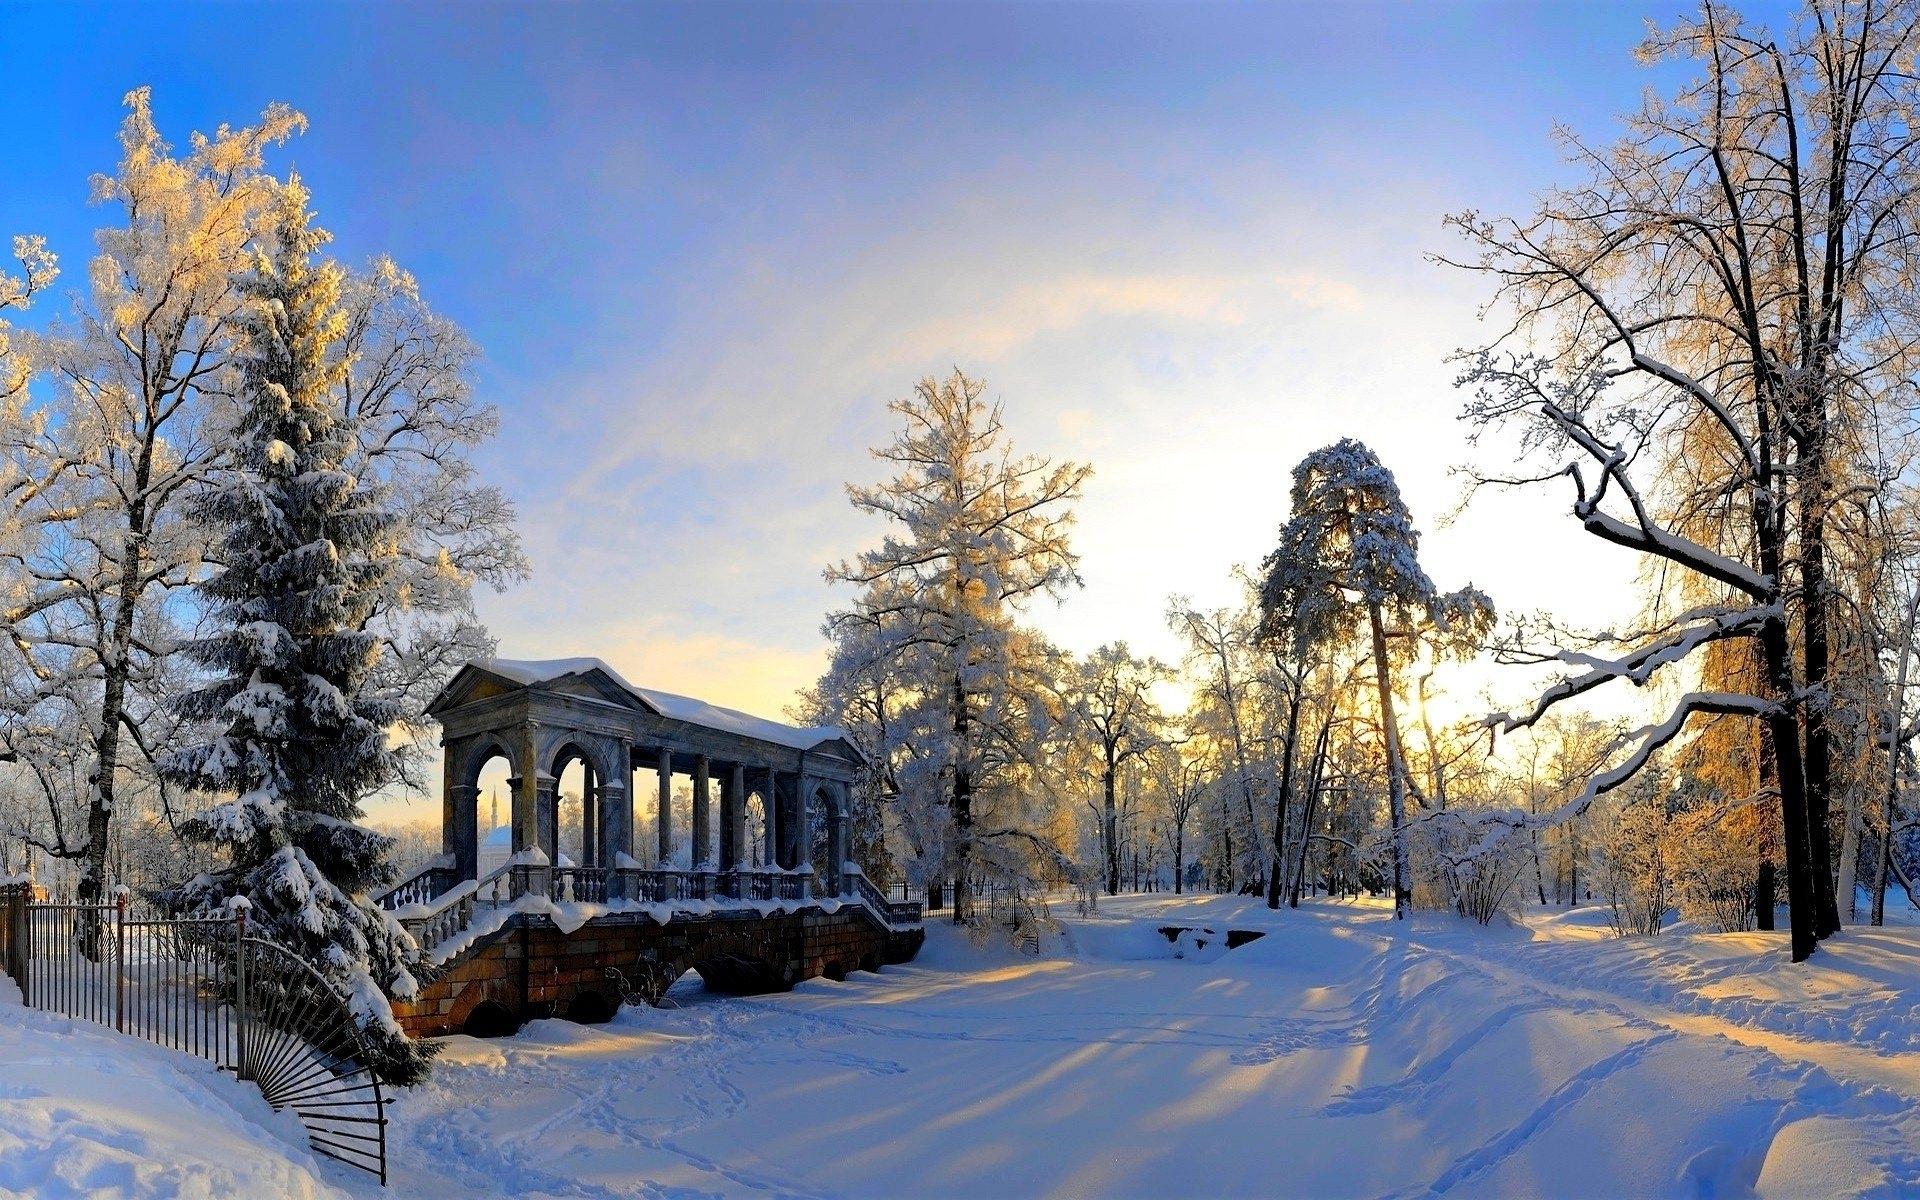 winter scenery wallpaper – hd widescreen | ms calendar | pinterest